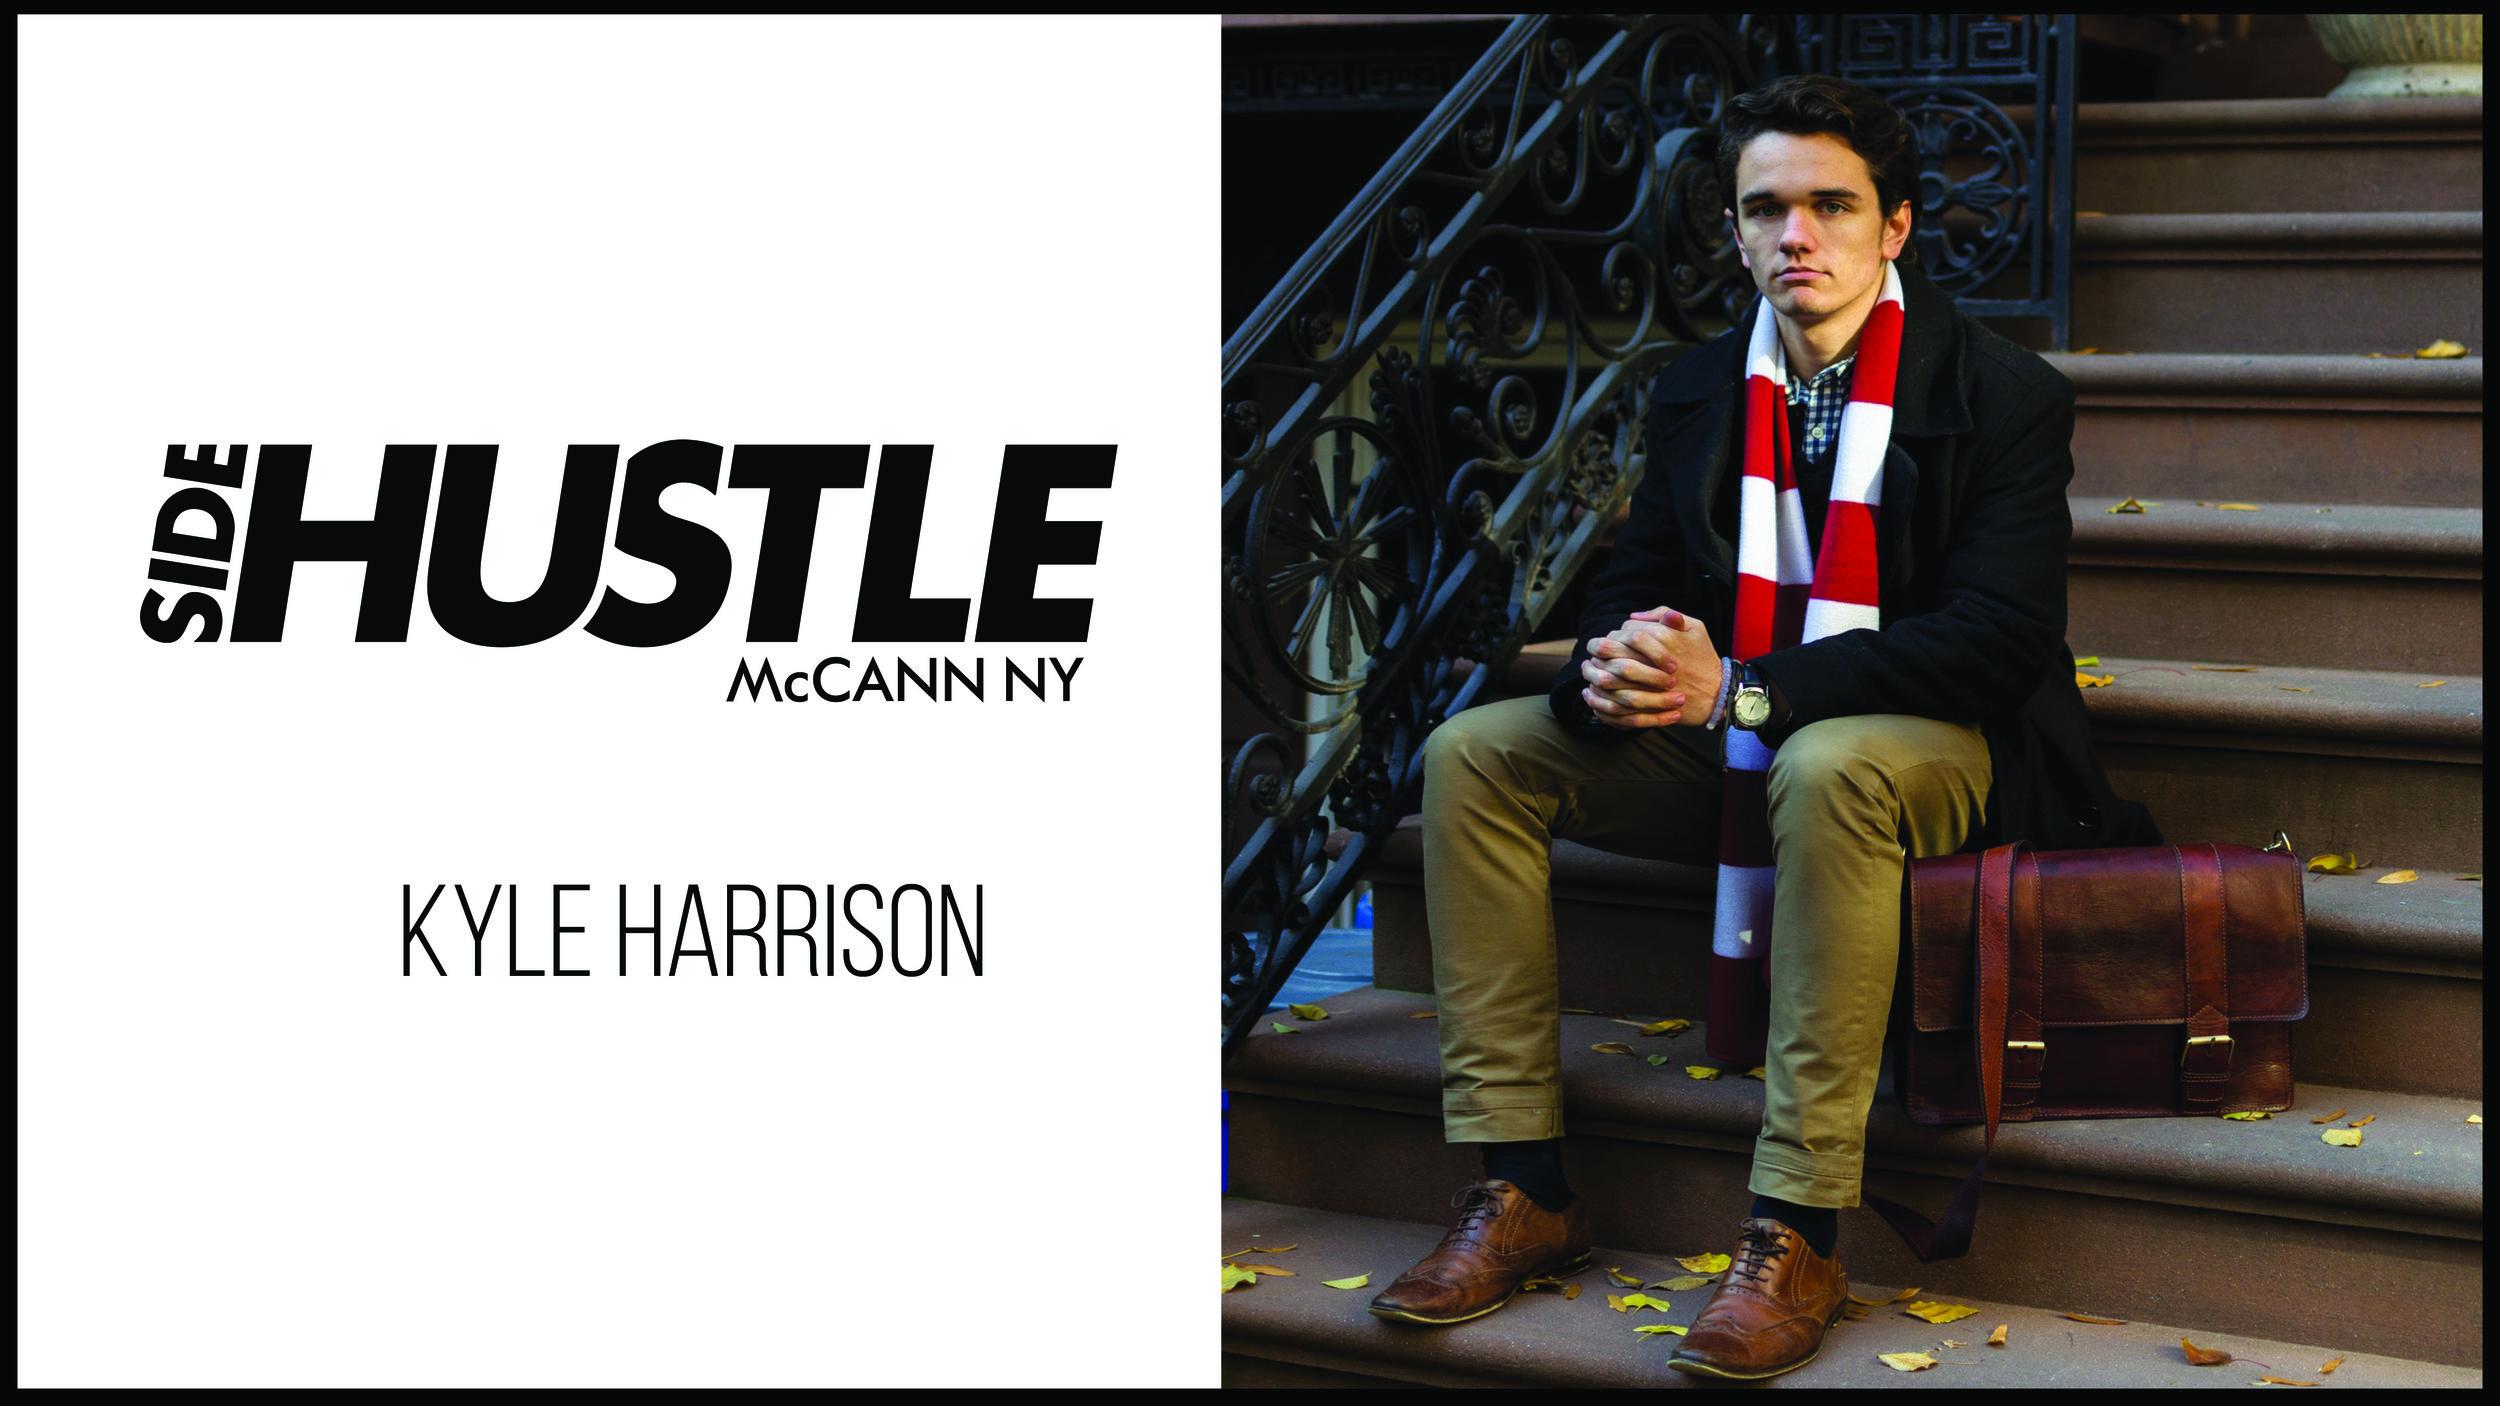 KyleHarrison_SideHustle.jpg